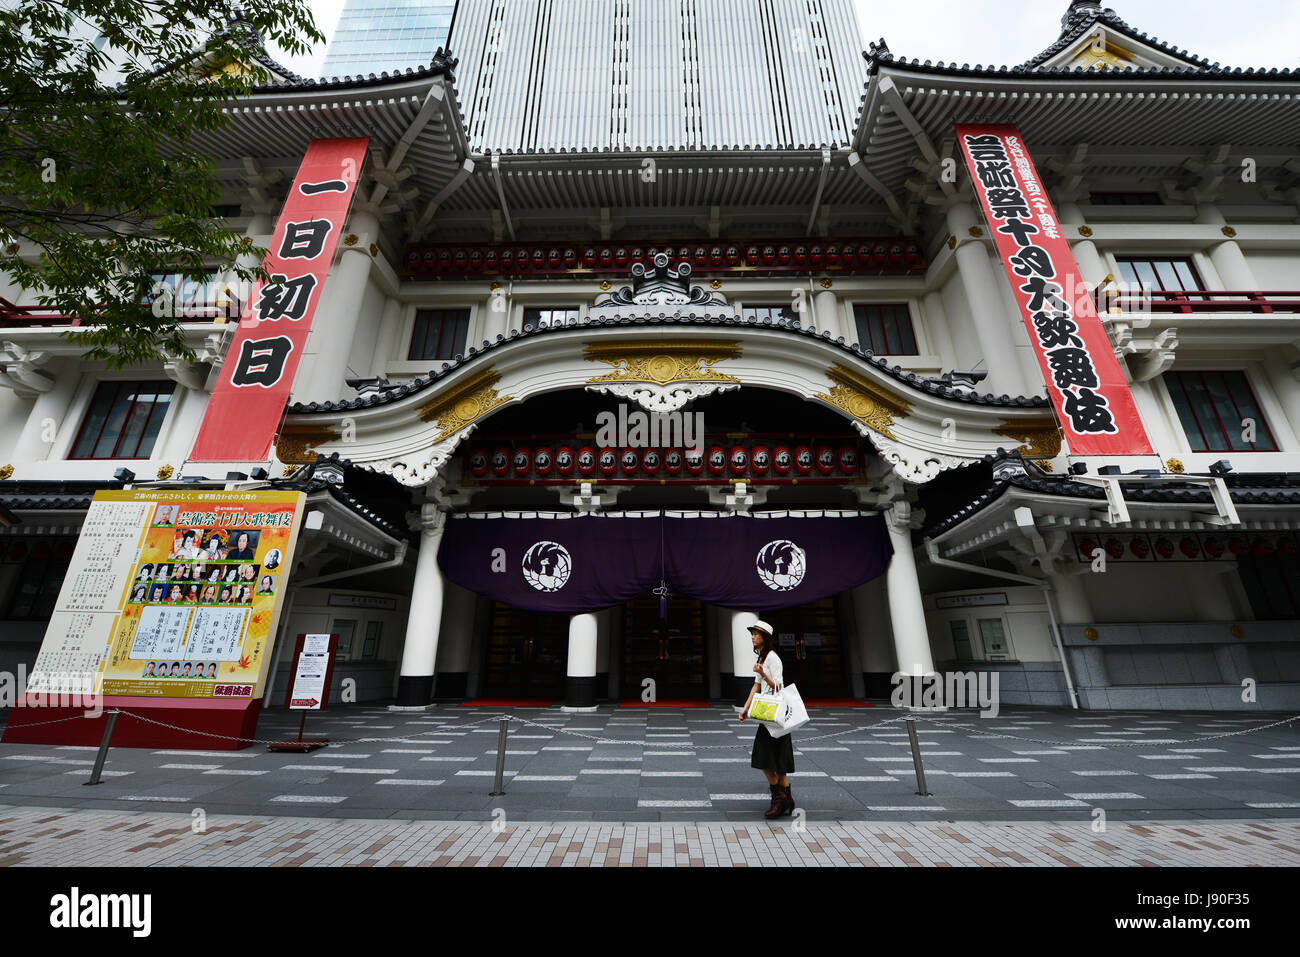 The Kabuki-Za theater in Ginza, Tokyo. - Stock Image